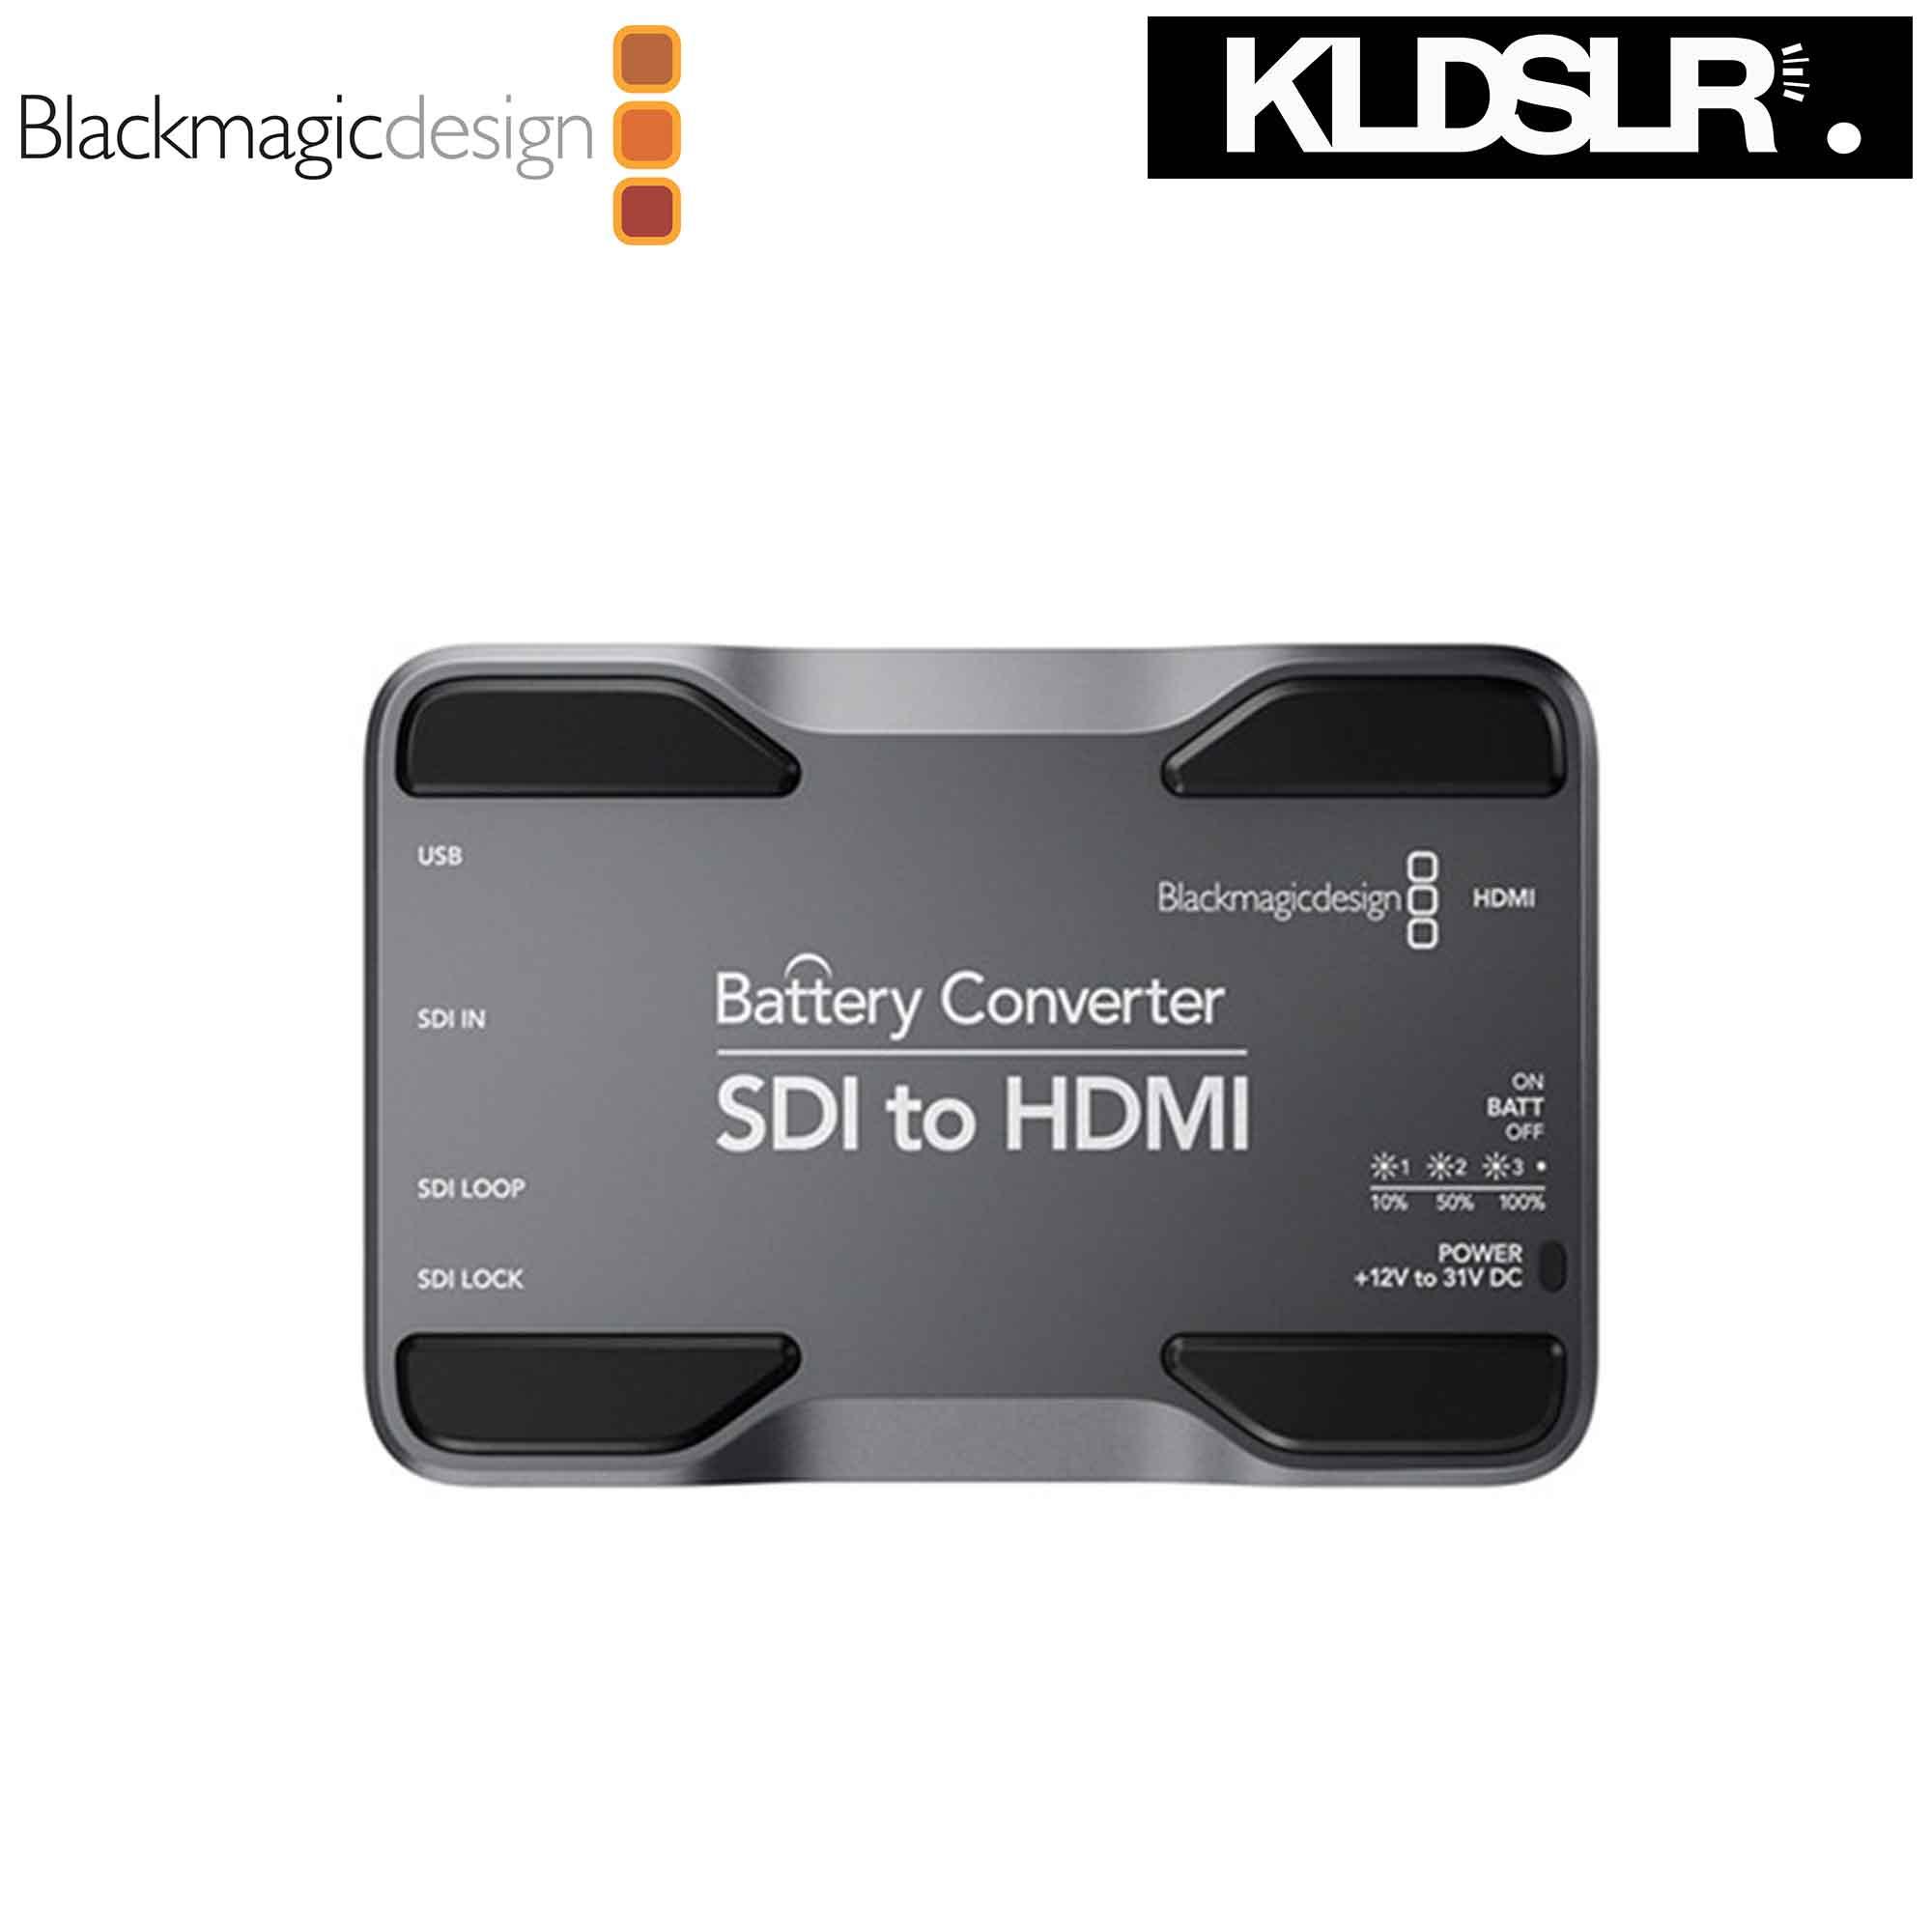 Blackmagic Design Sdi To Hdmi Battery Converter Malaysia